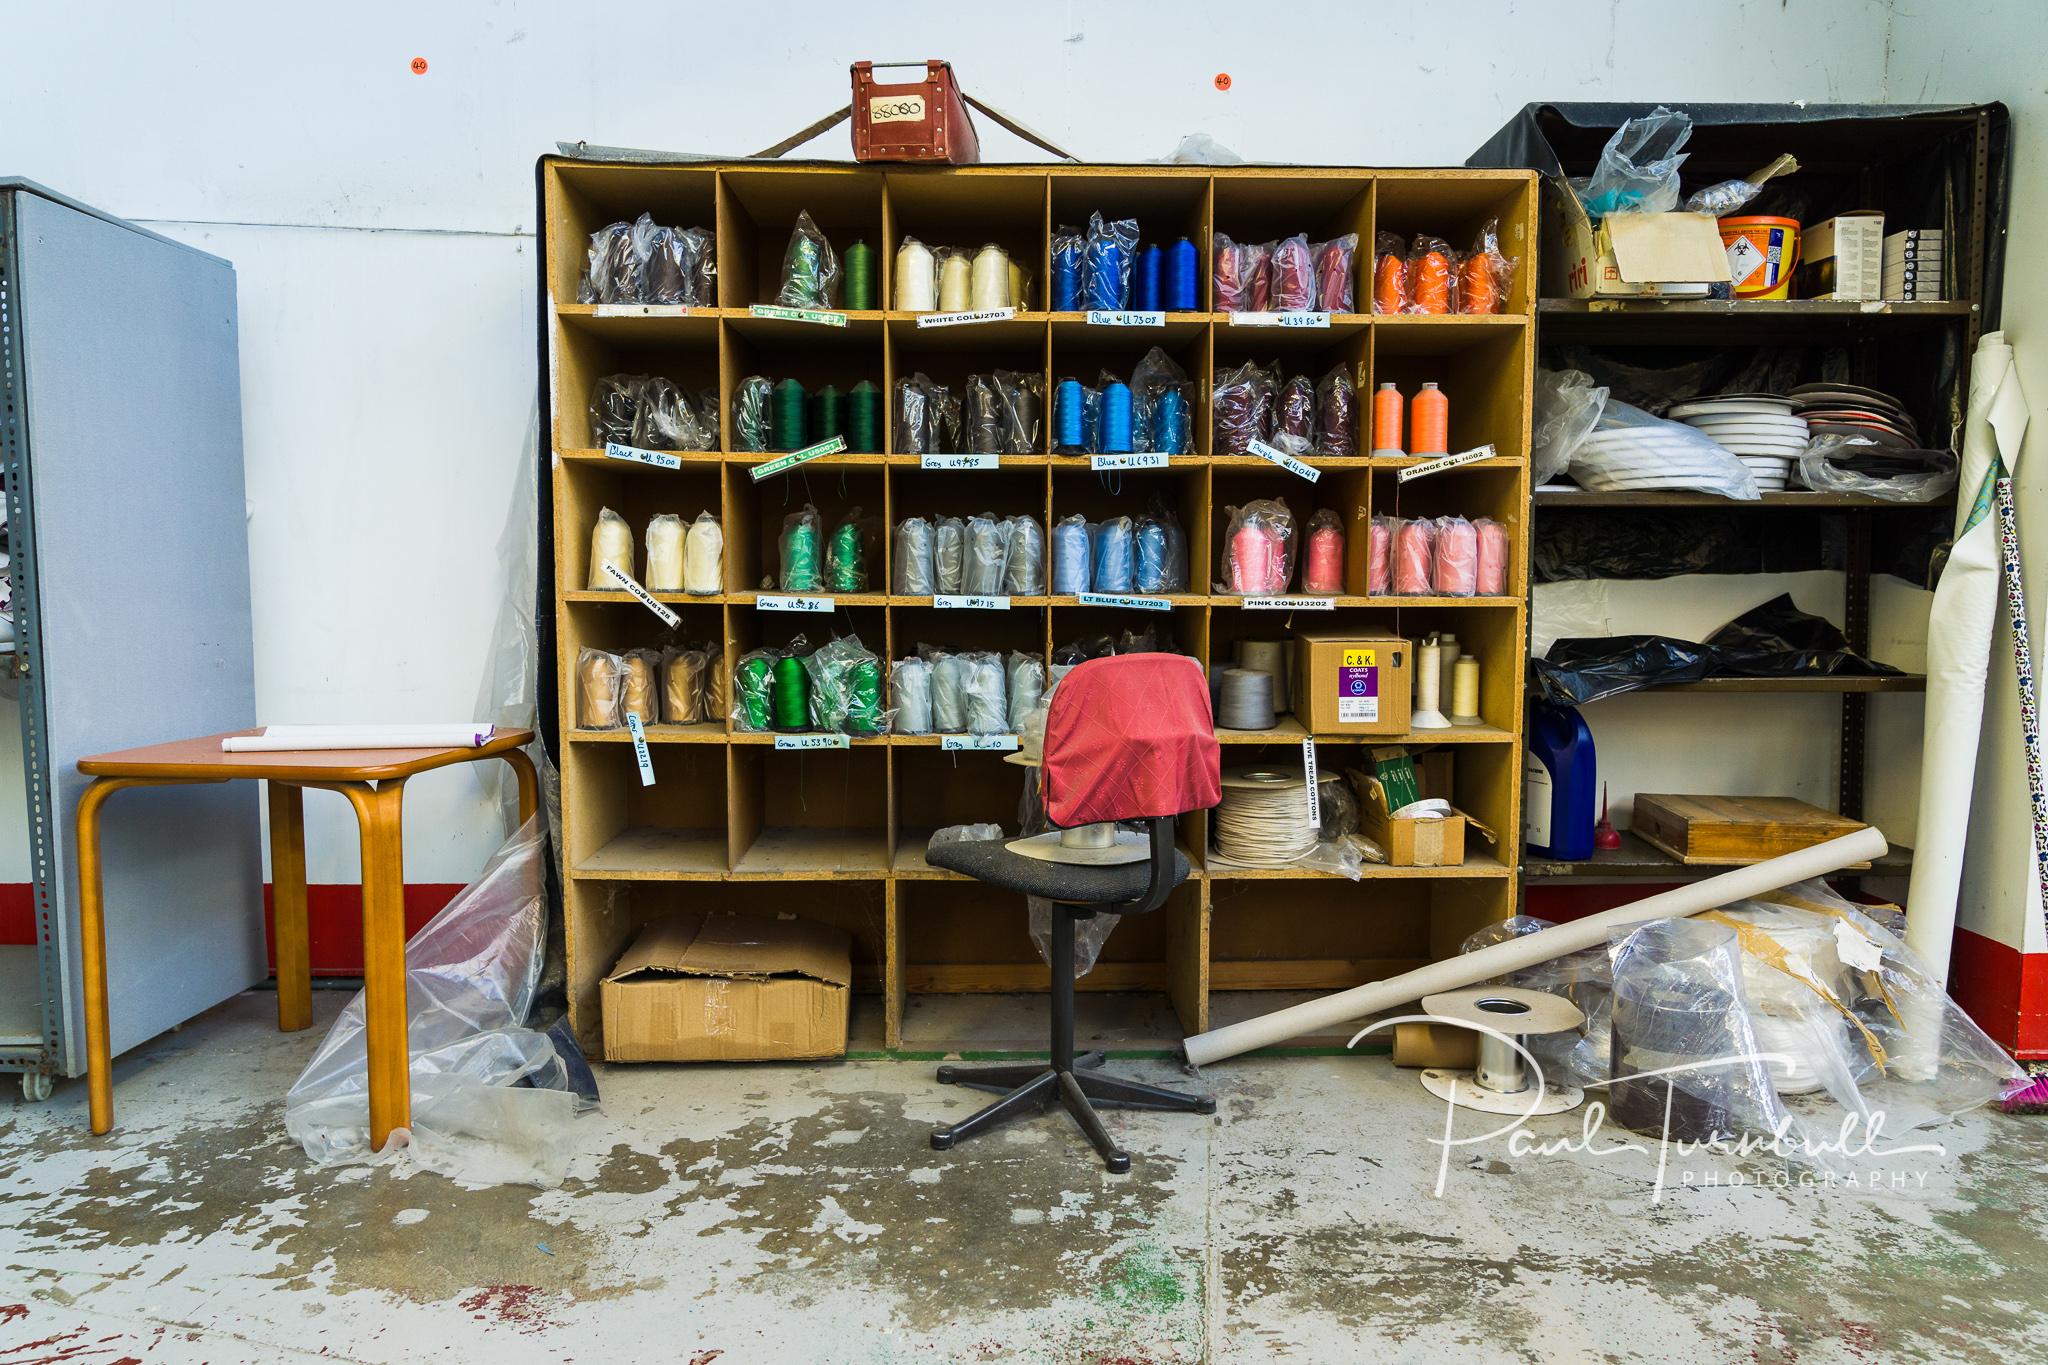 commercial-photographer-leeds-bradford-knightsbridge-furniture-tour-049.jpg